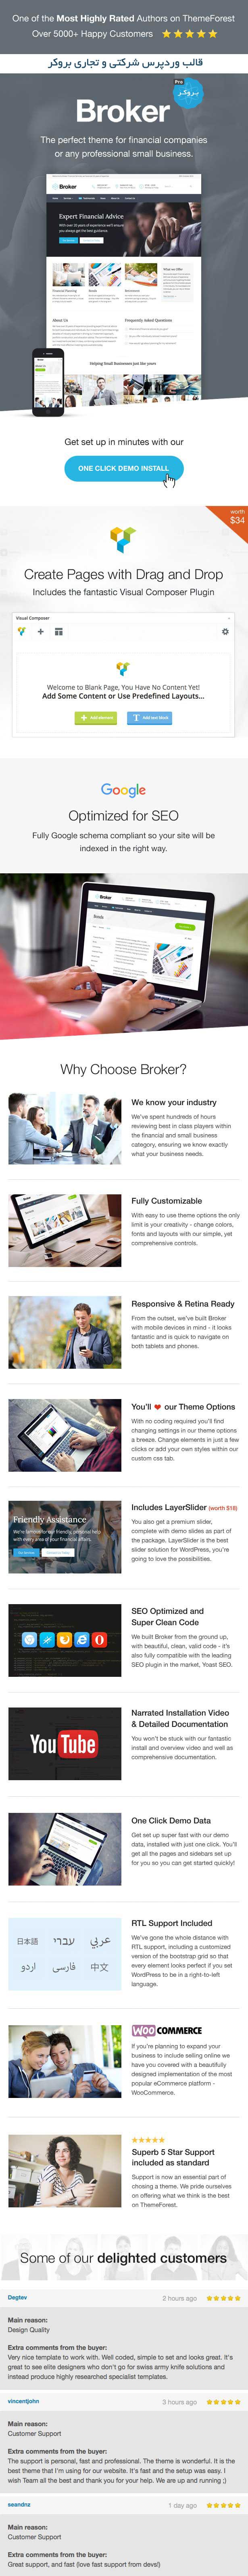 قالب شرکتی وردپرس بروکر | Broker Business Wordpress Theme 3